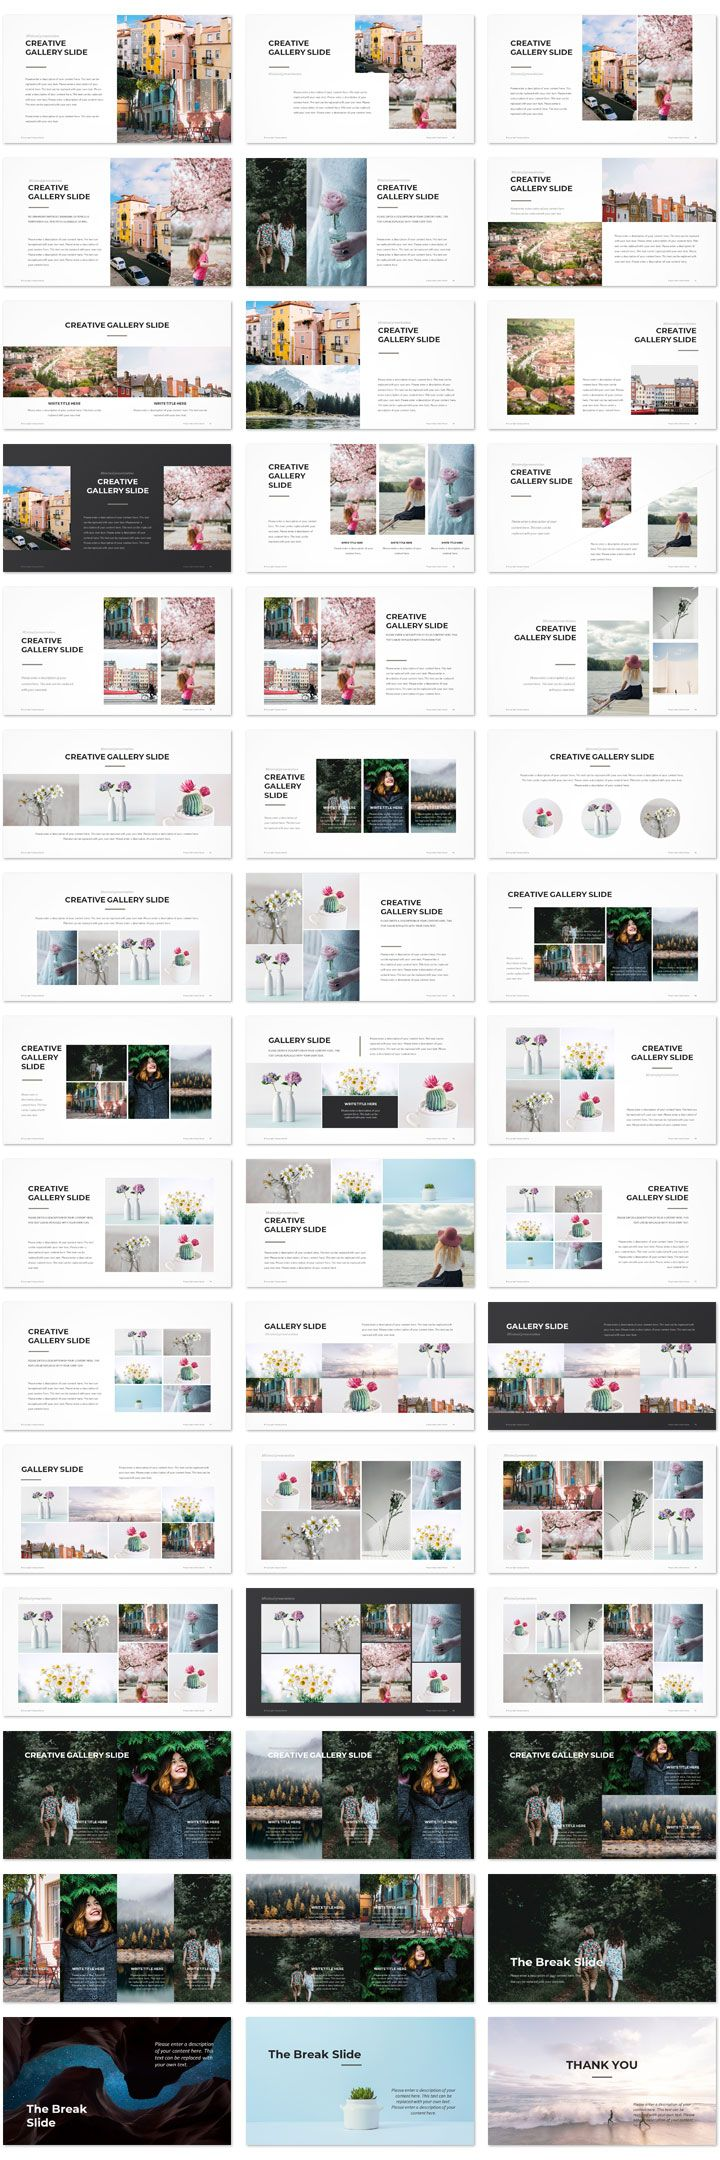 Creative gallery presentation template slide powerpoint art creative gallery presentation template slide powerpoint art pinterest presentation templates template and creative toneelgroepblik Images